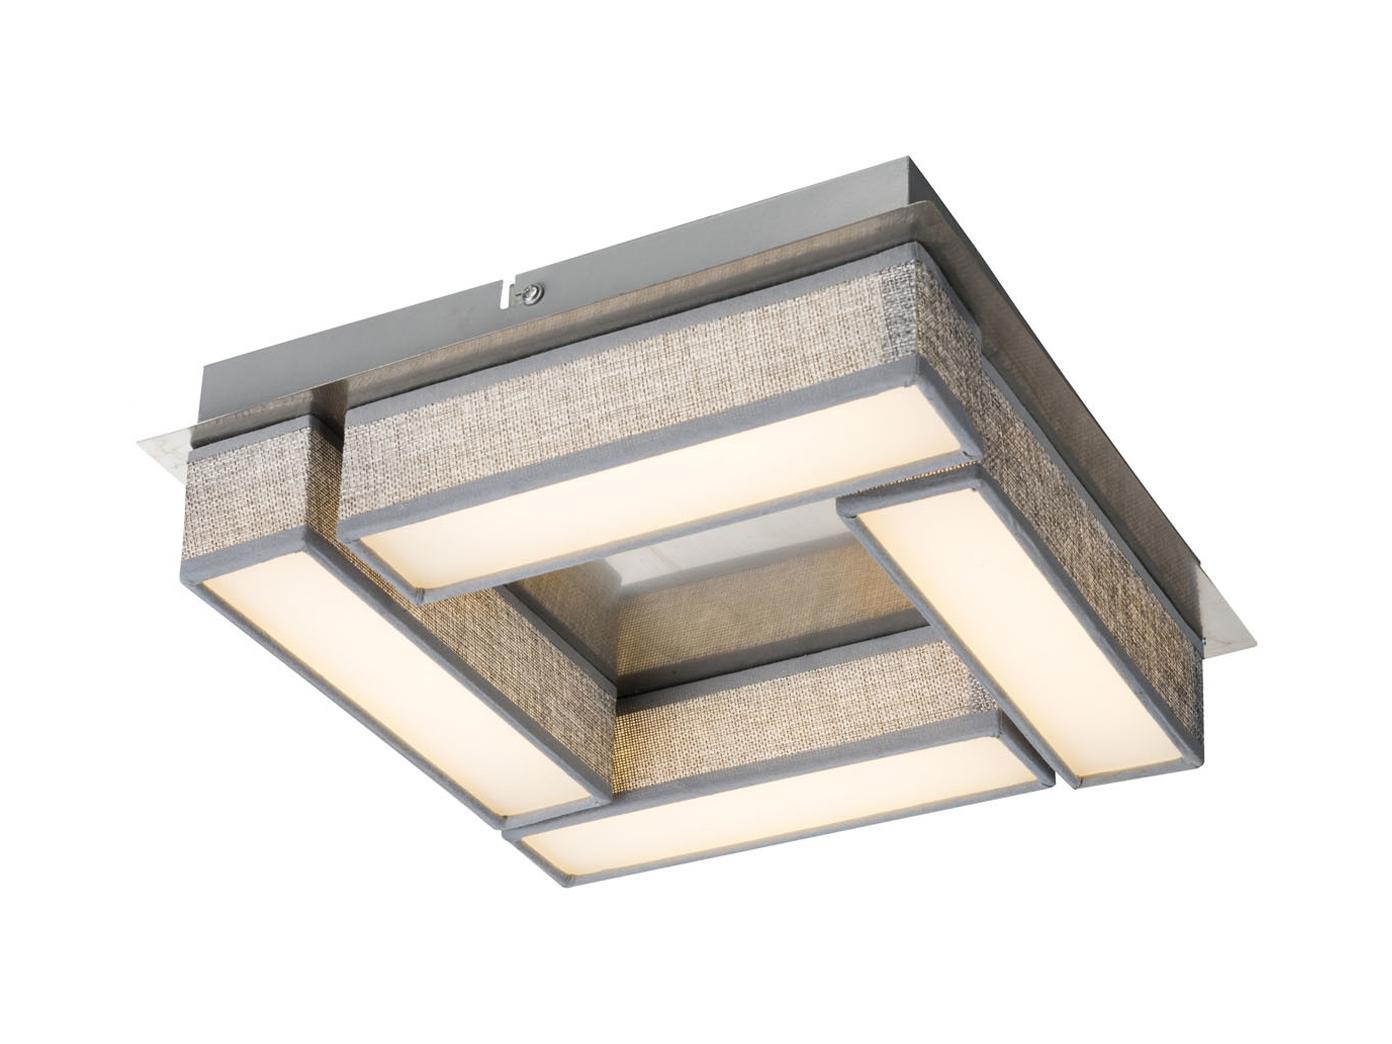 Moderne Led Deckenleuchte Paco 30x30 Cm Textil Grau Deckenlampe